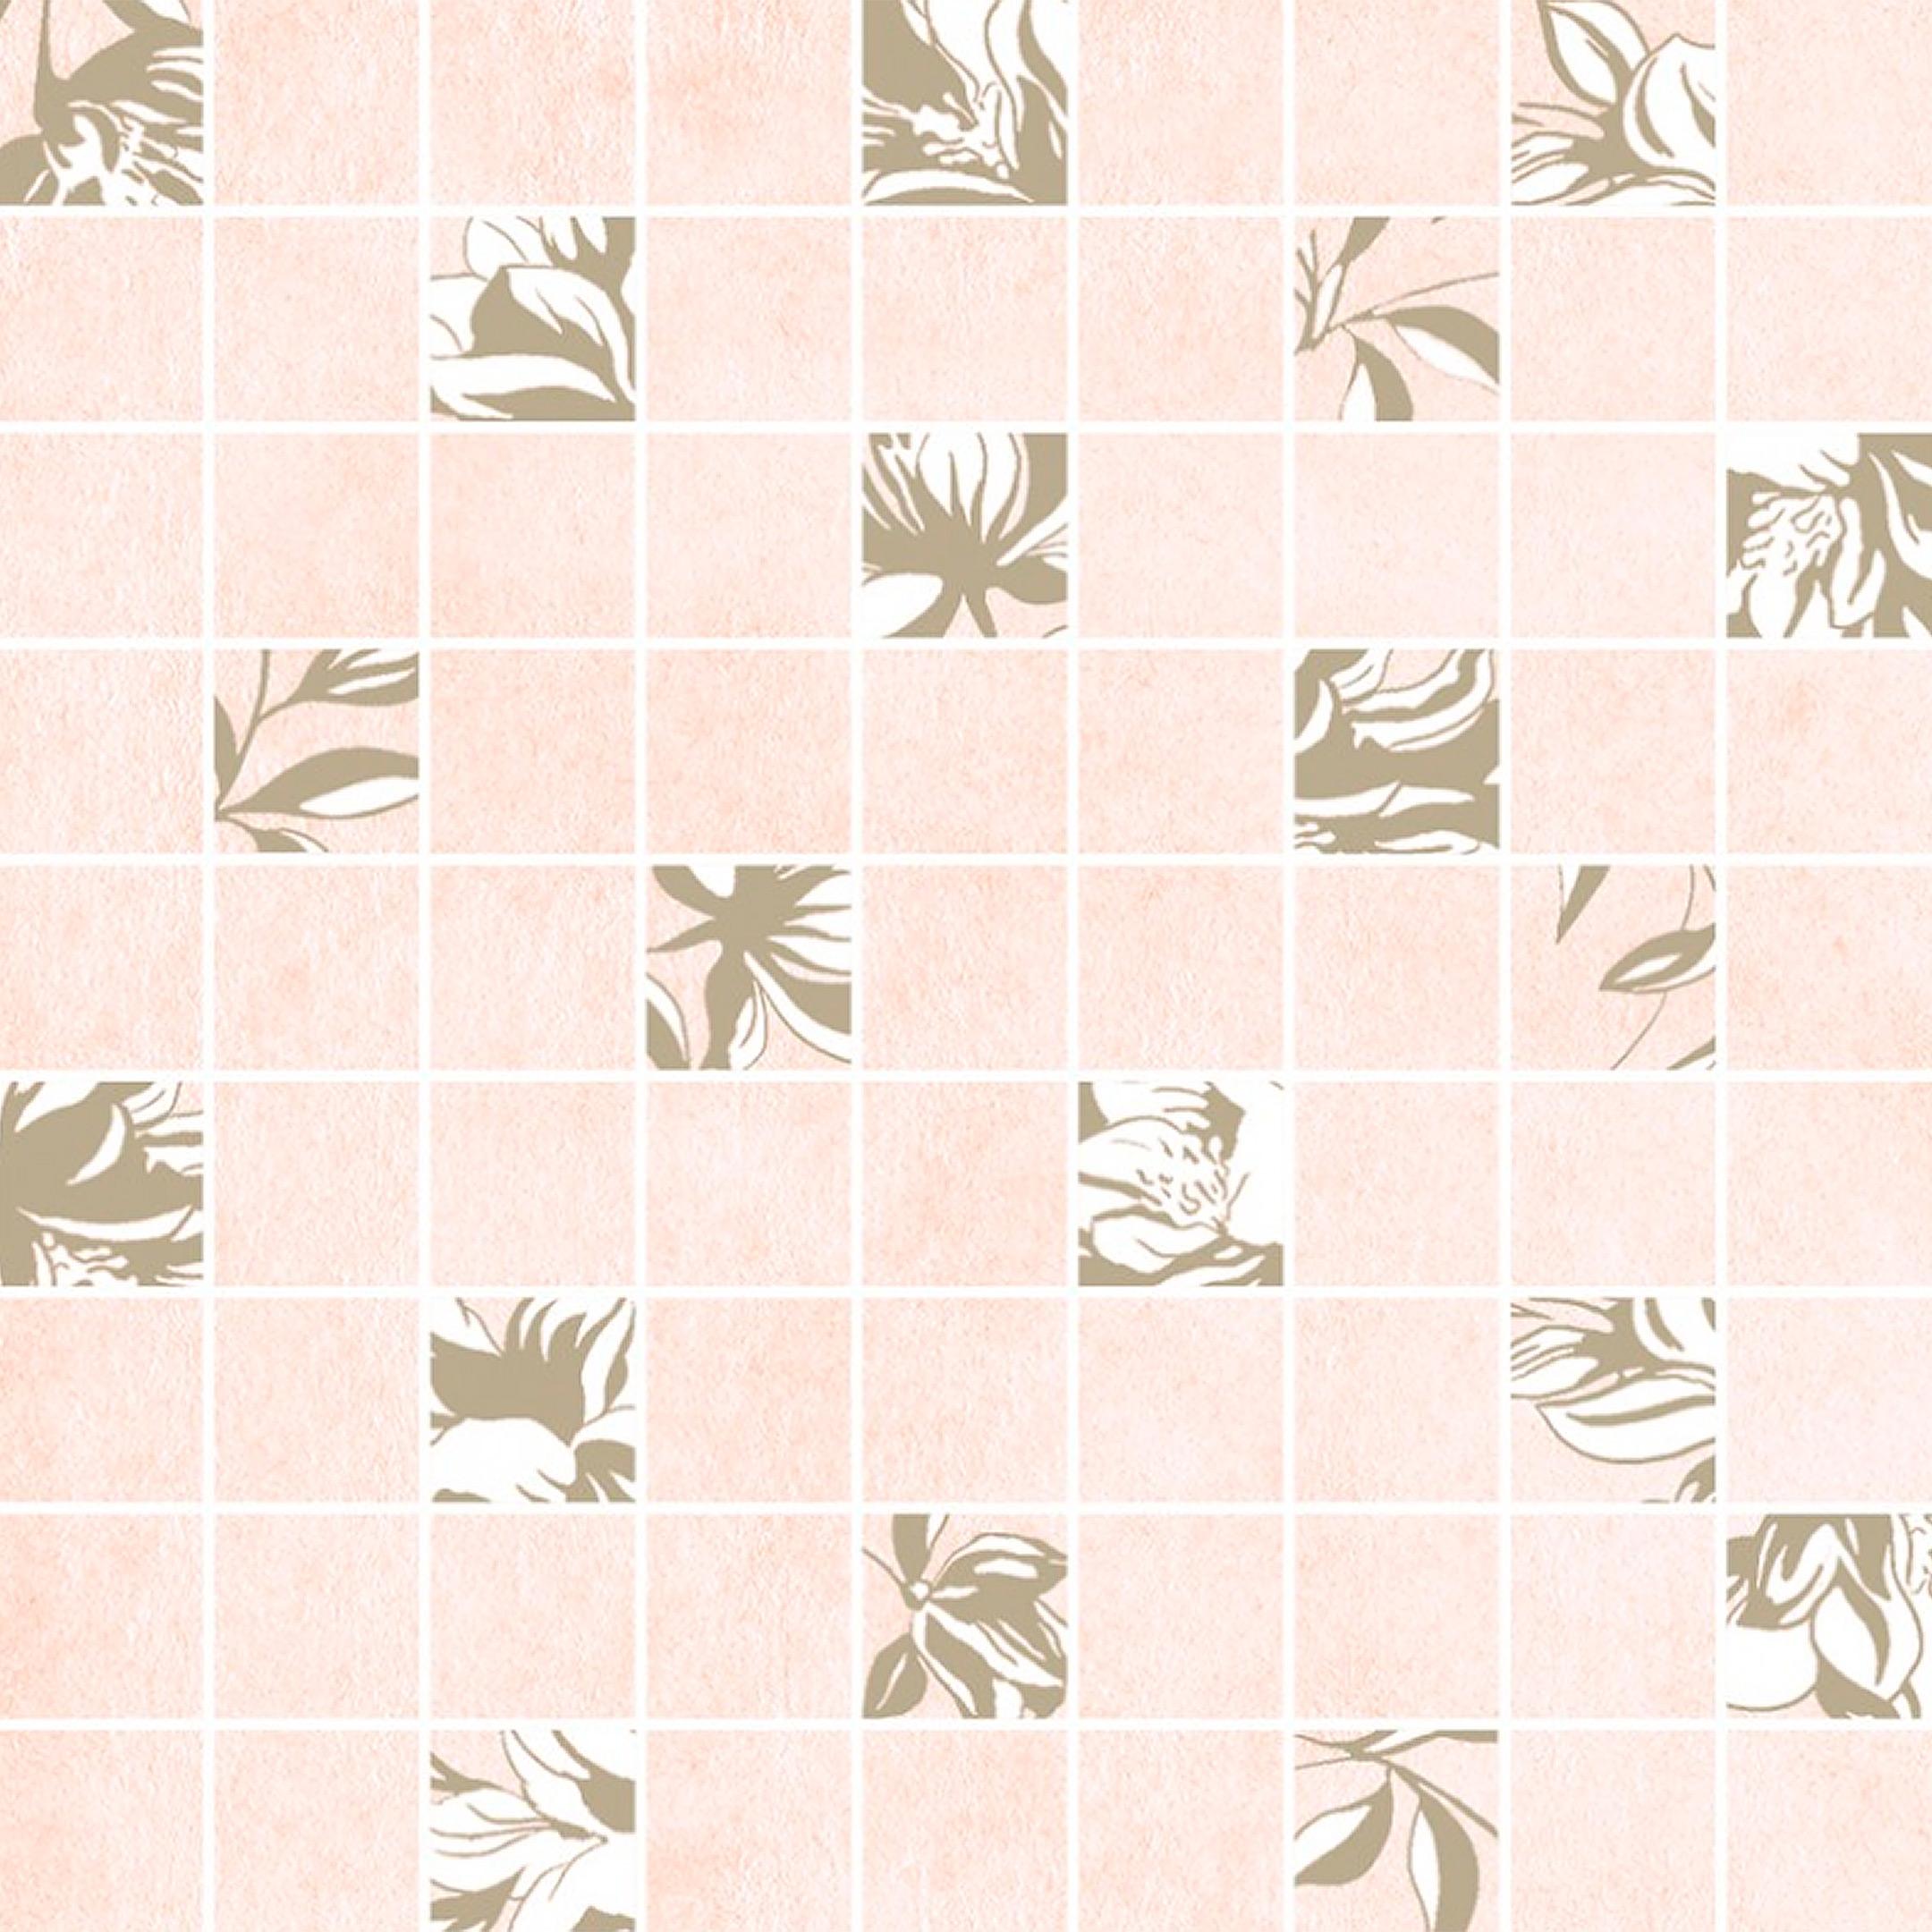 Плитка декор Cersanit Chantal мозаика бежевый 300x300x8,5 мм